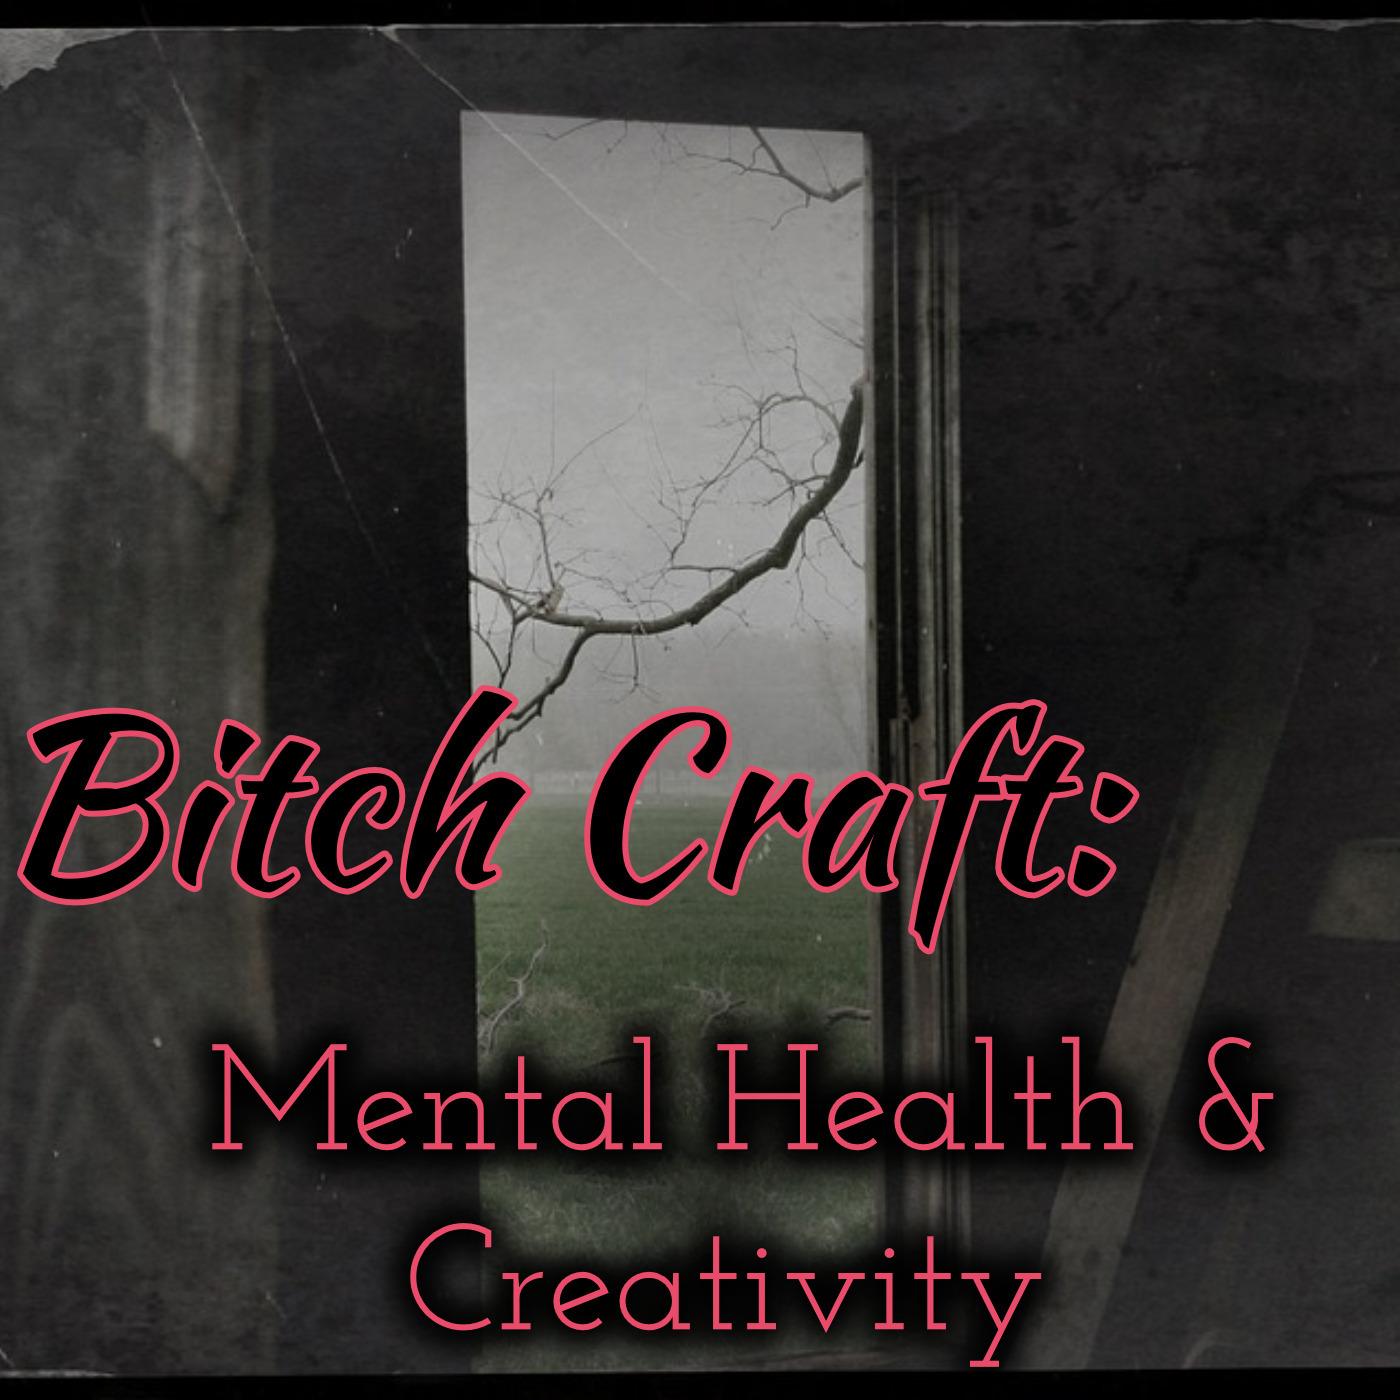 Mental Health & Creativity